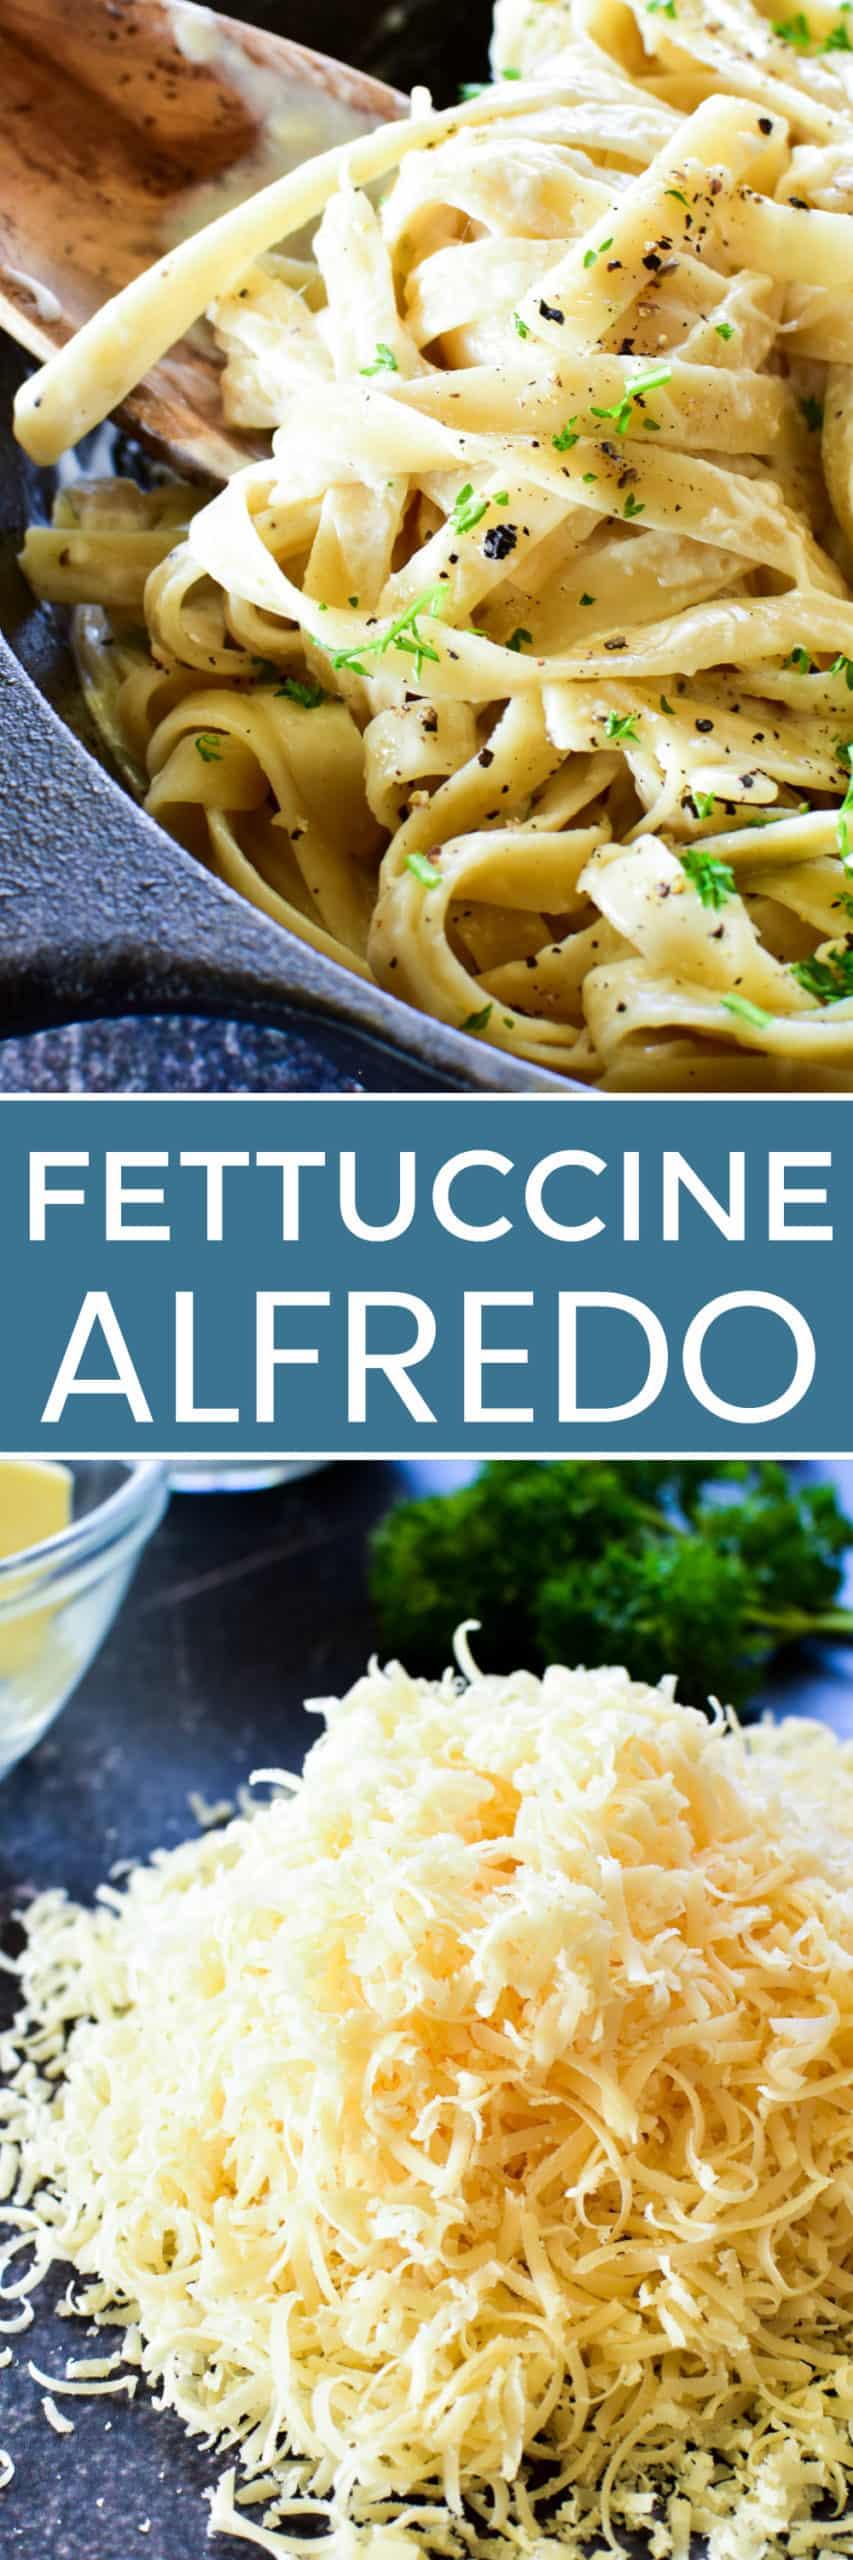 Collage image of Fettuccine Alfredo